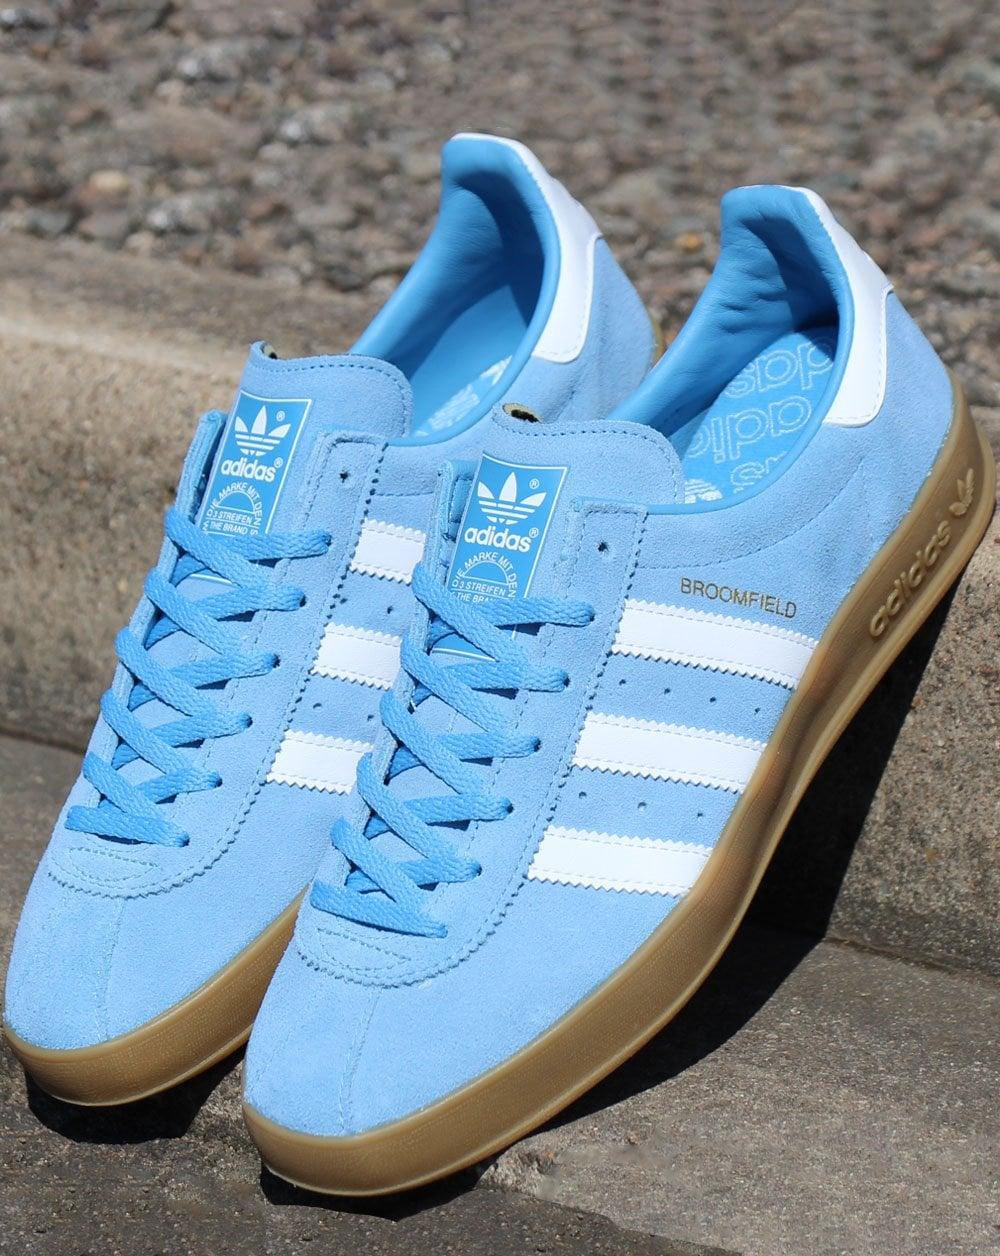 Adidas Broomfield Trainers Sky Blue/White